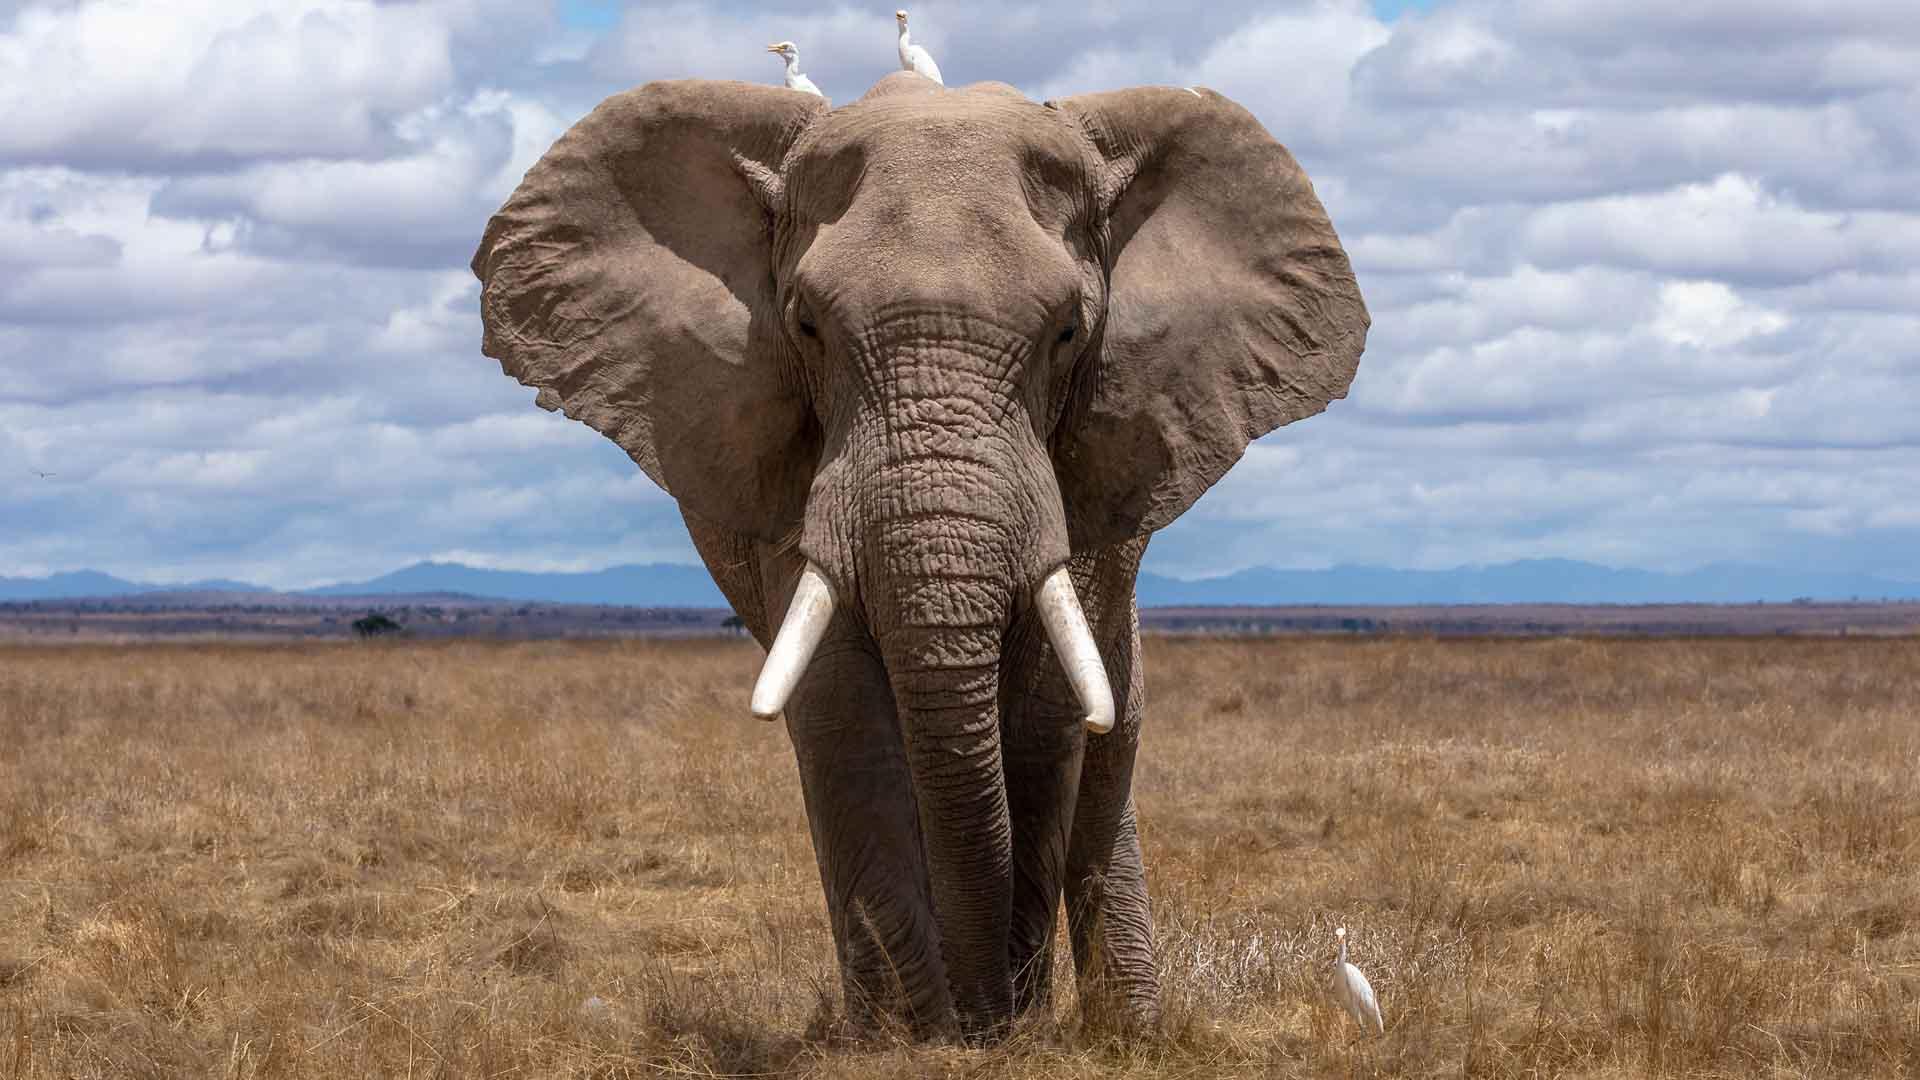 Gli elefanti sono vittime dei bracconieri in Africa